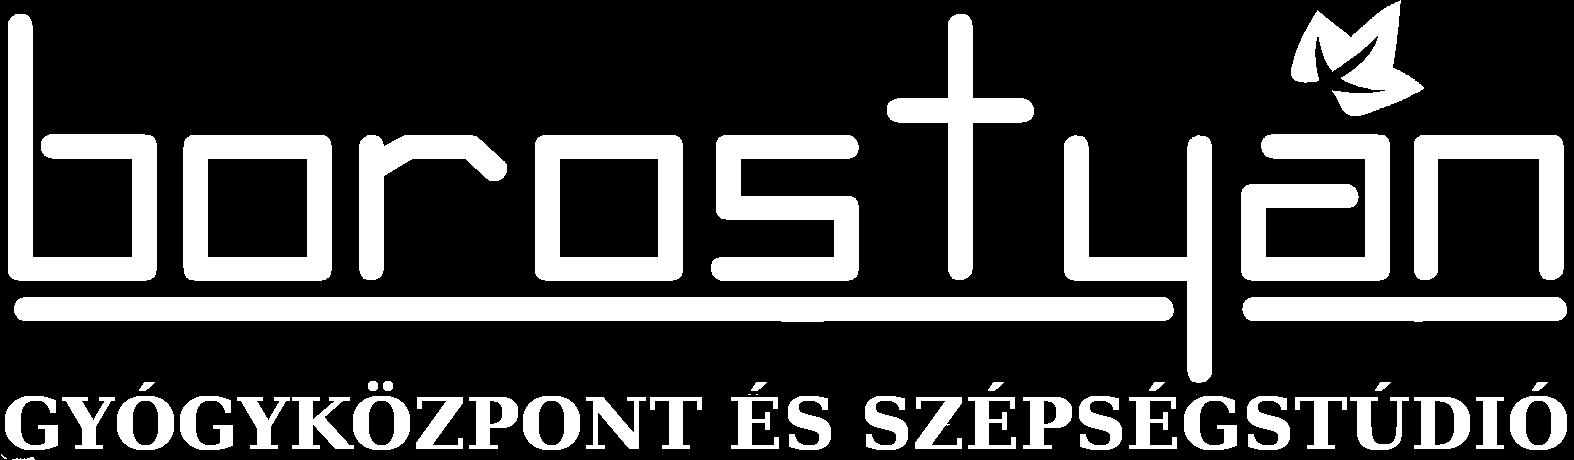 Borostyán Med Hotel - Hotel Borostyán, Medical hotel Hungary - Kardiológia